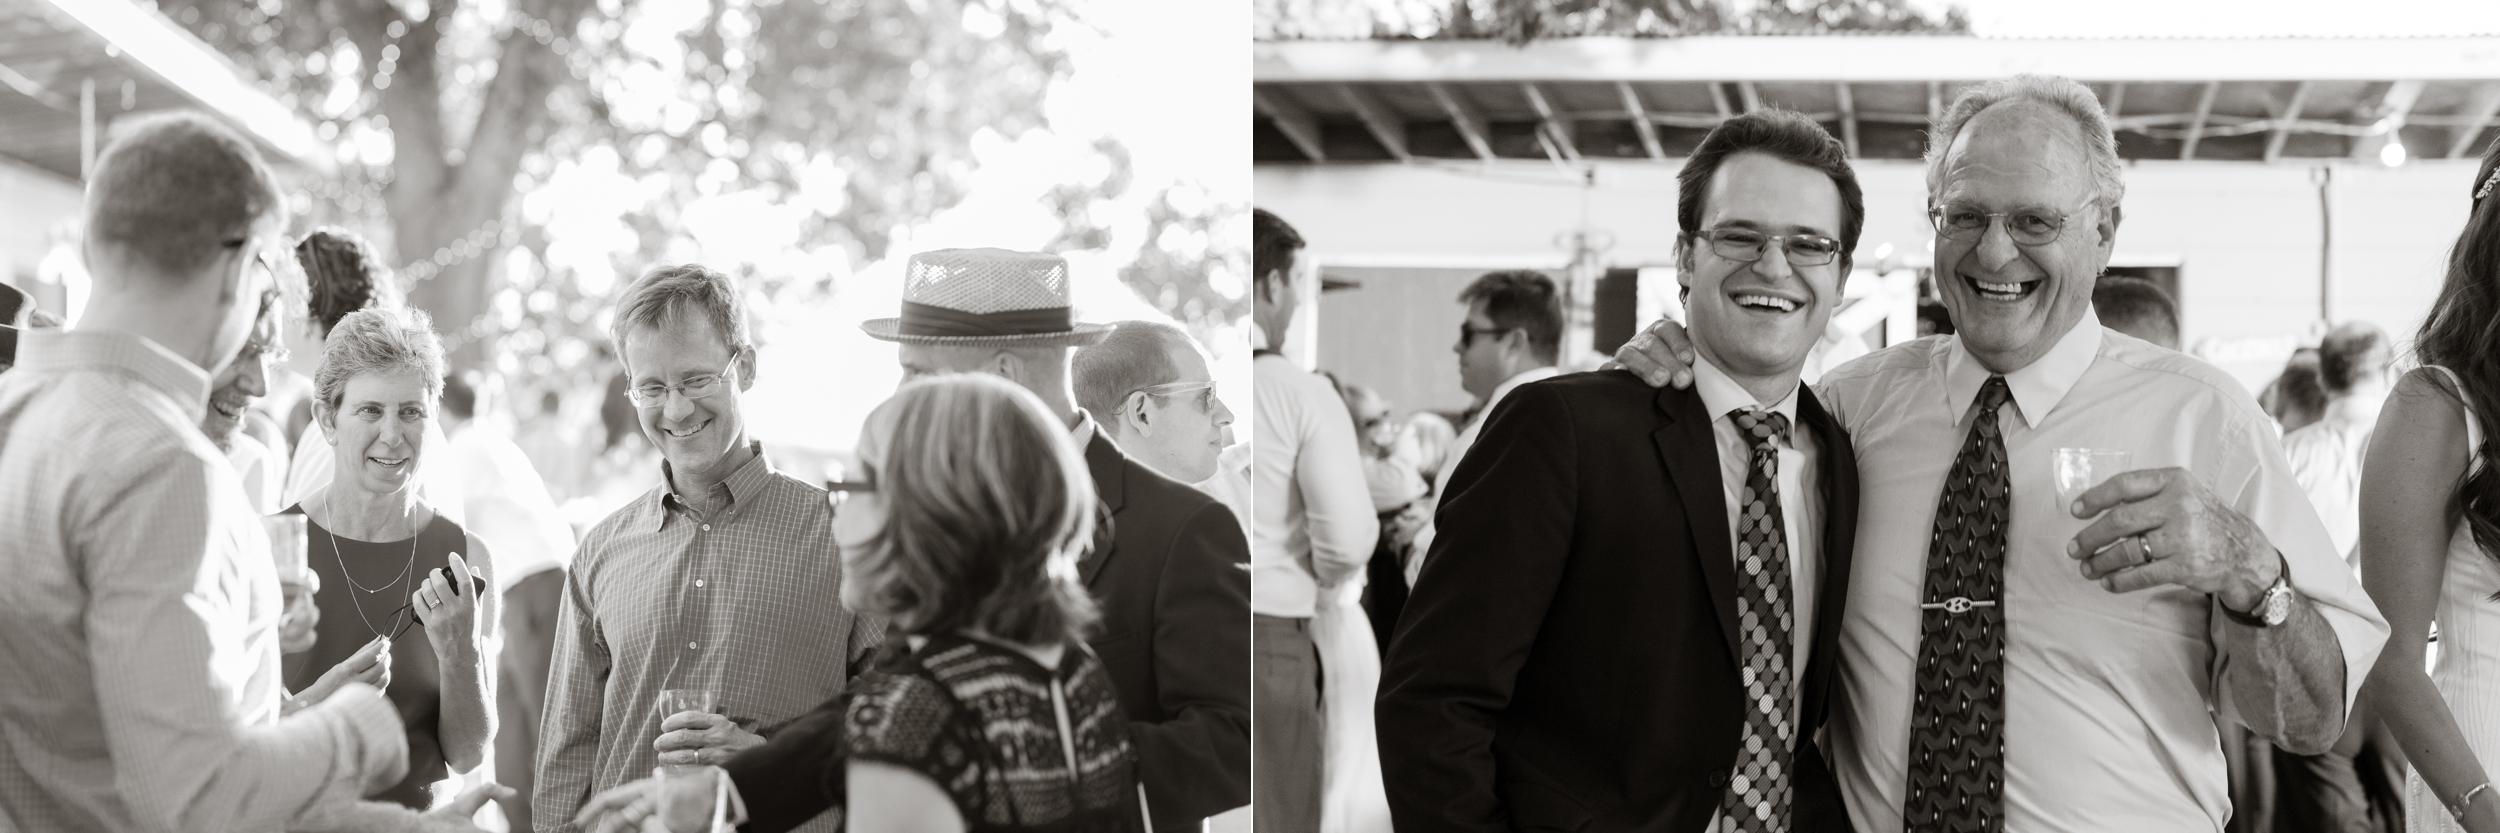 california-ranch-wedding-photographer-vc076_WEB.jpg